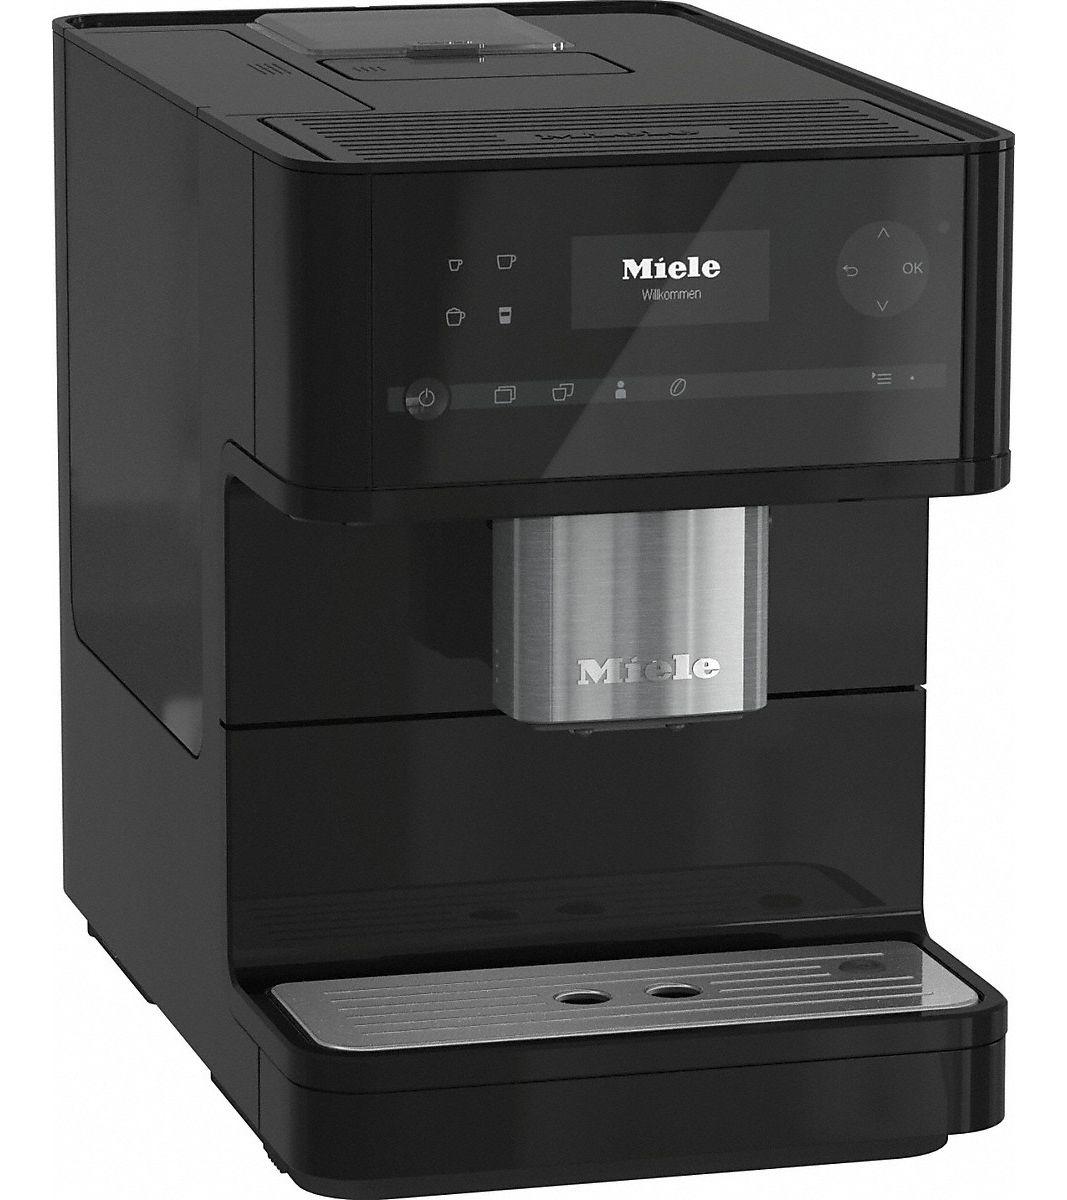 CM 6150 | Coffee machine, Pod coffee machine